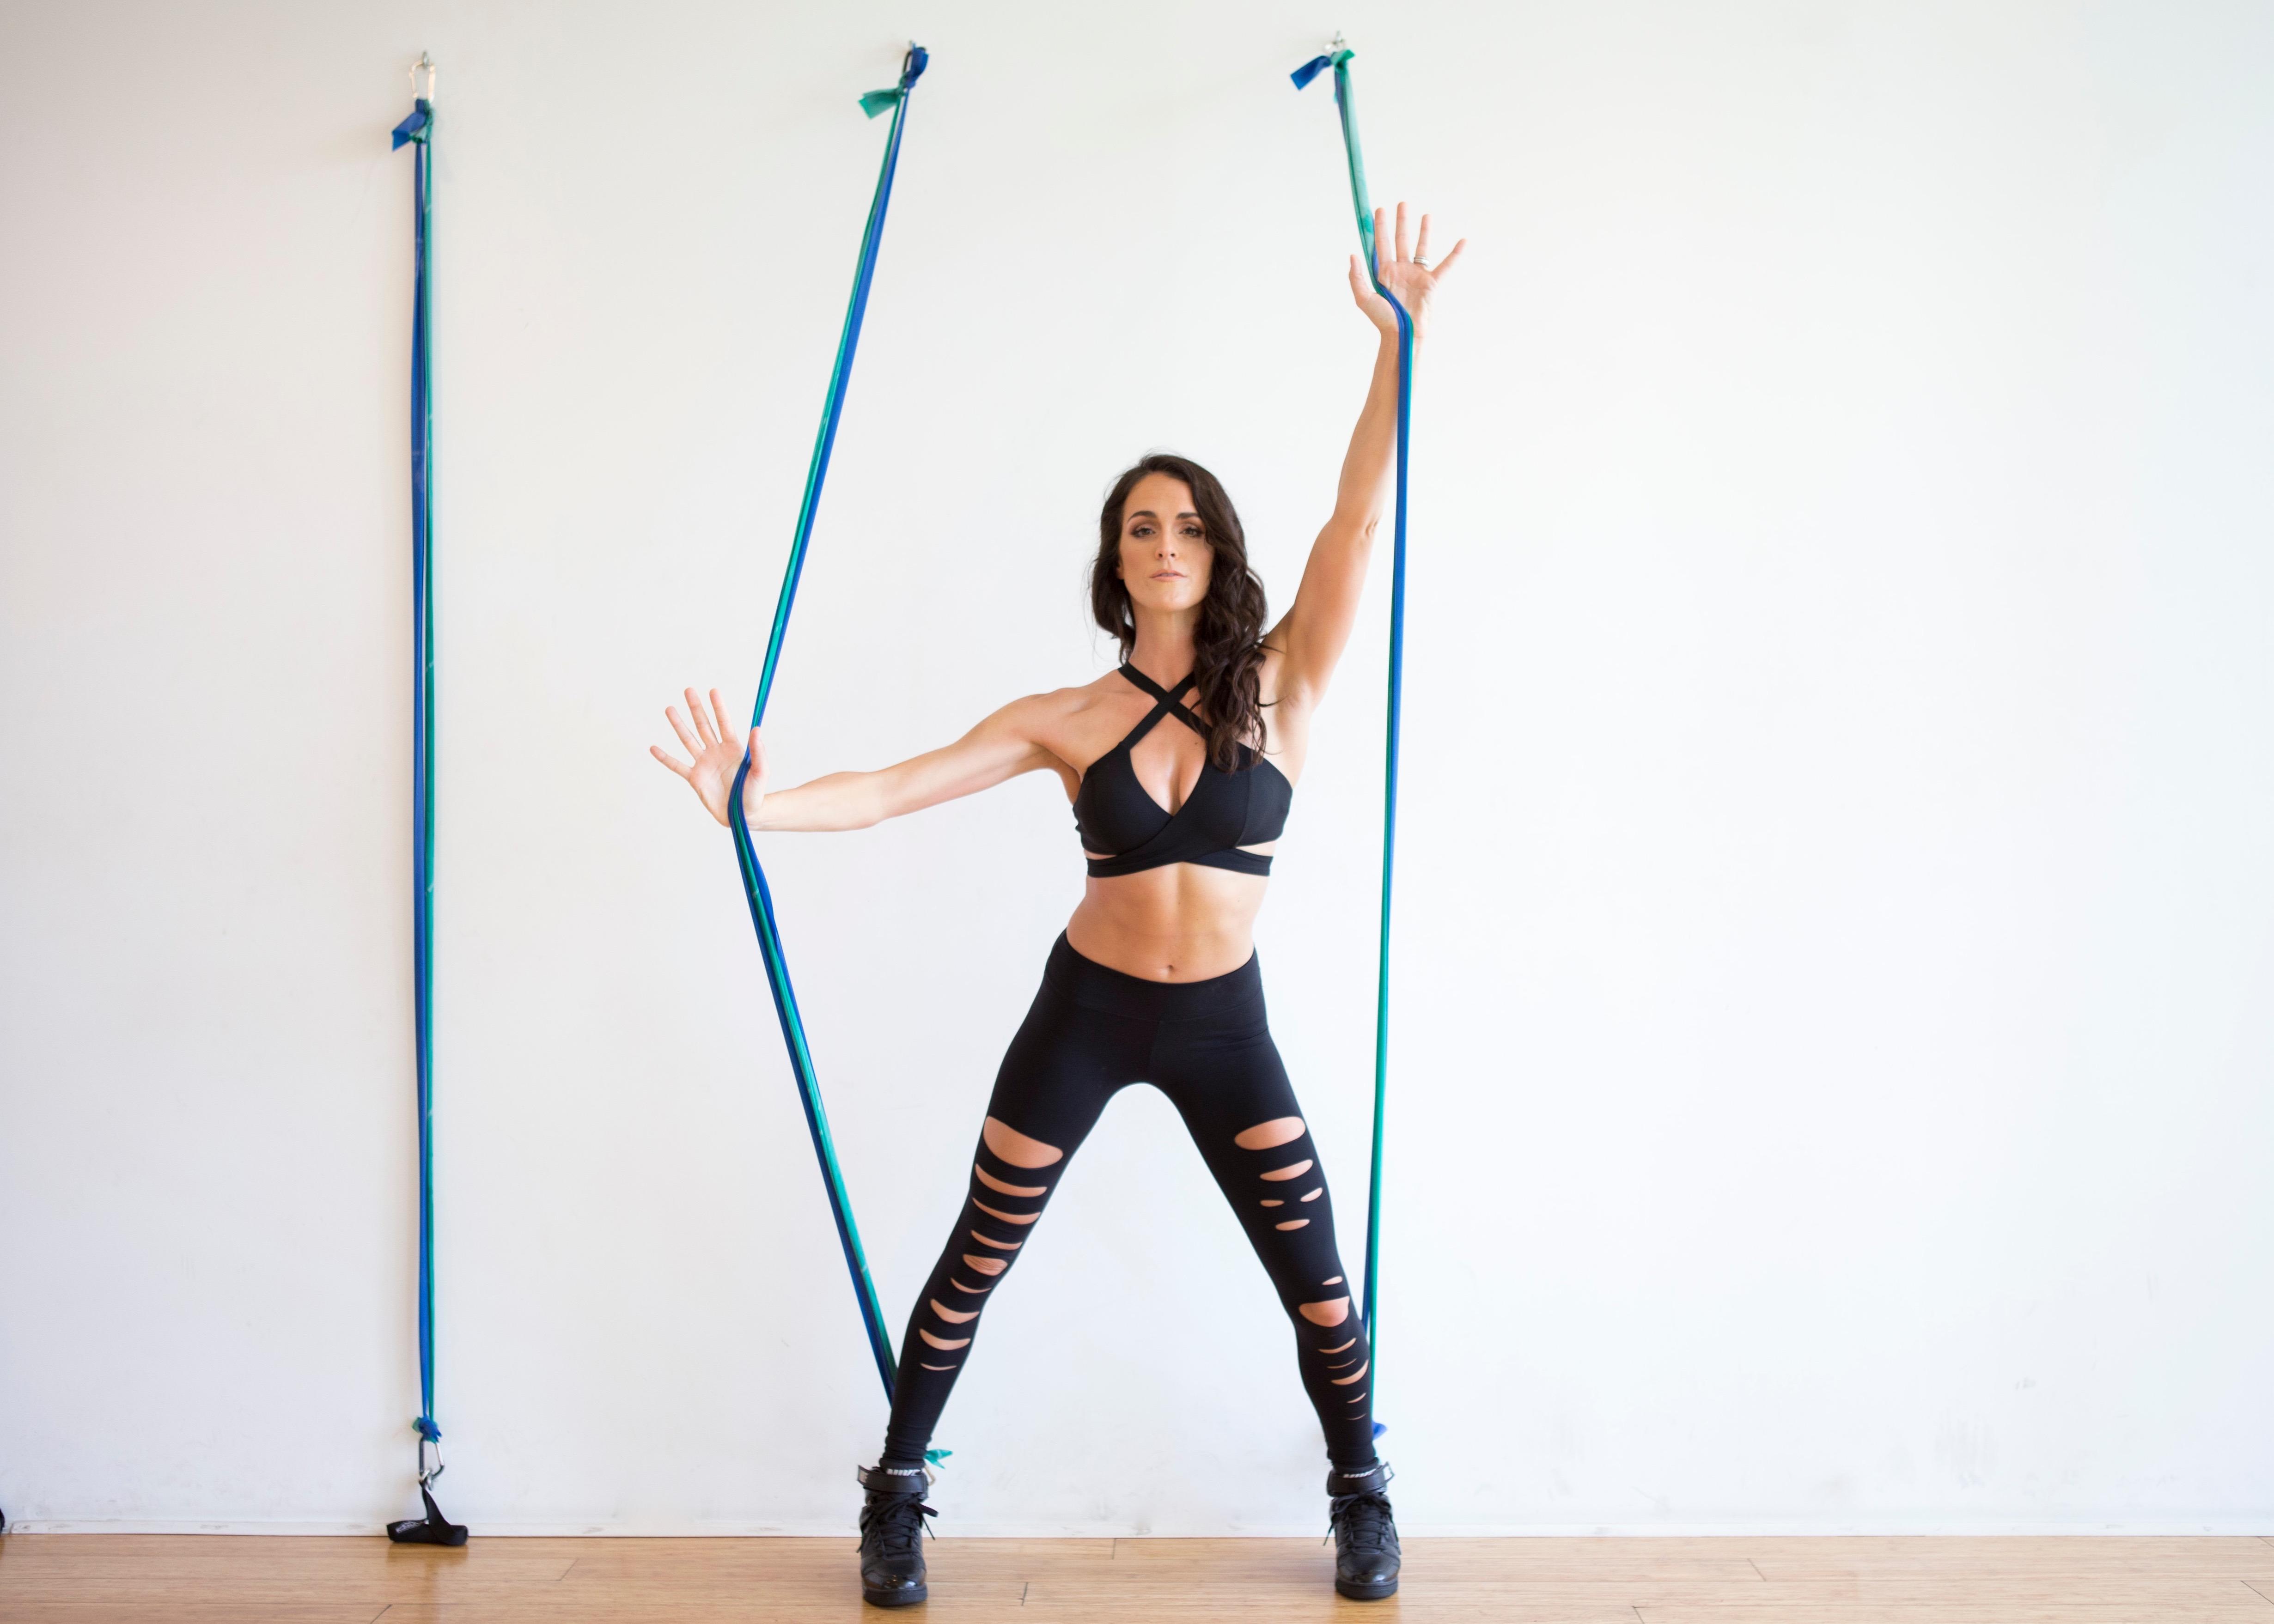 LA's Hottest Trainer 2015 Contestant #2: Erica Hood, Body By Simone